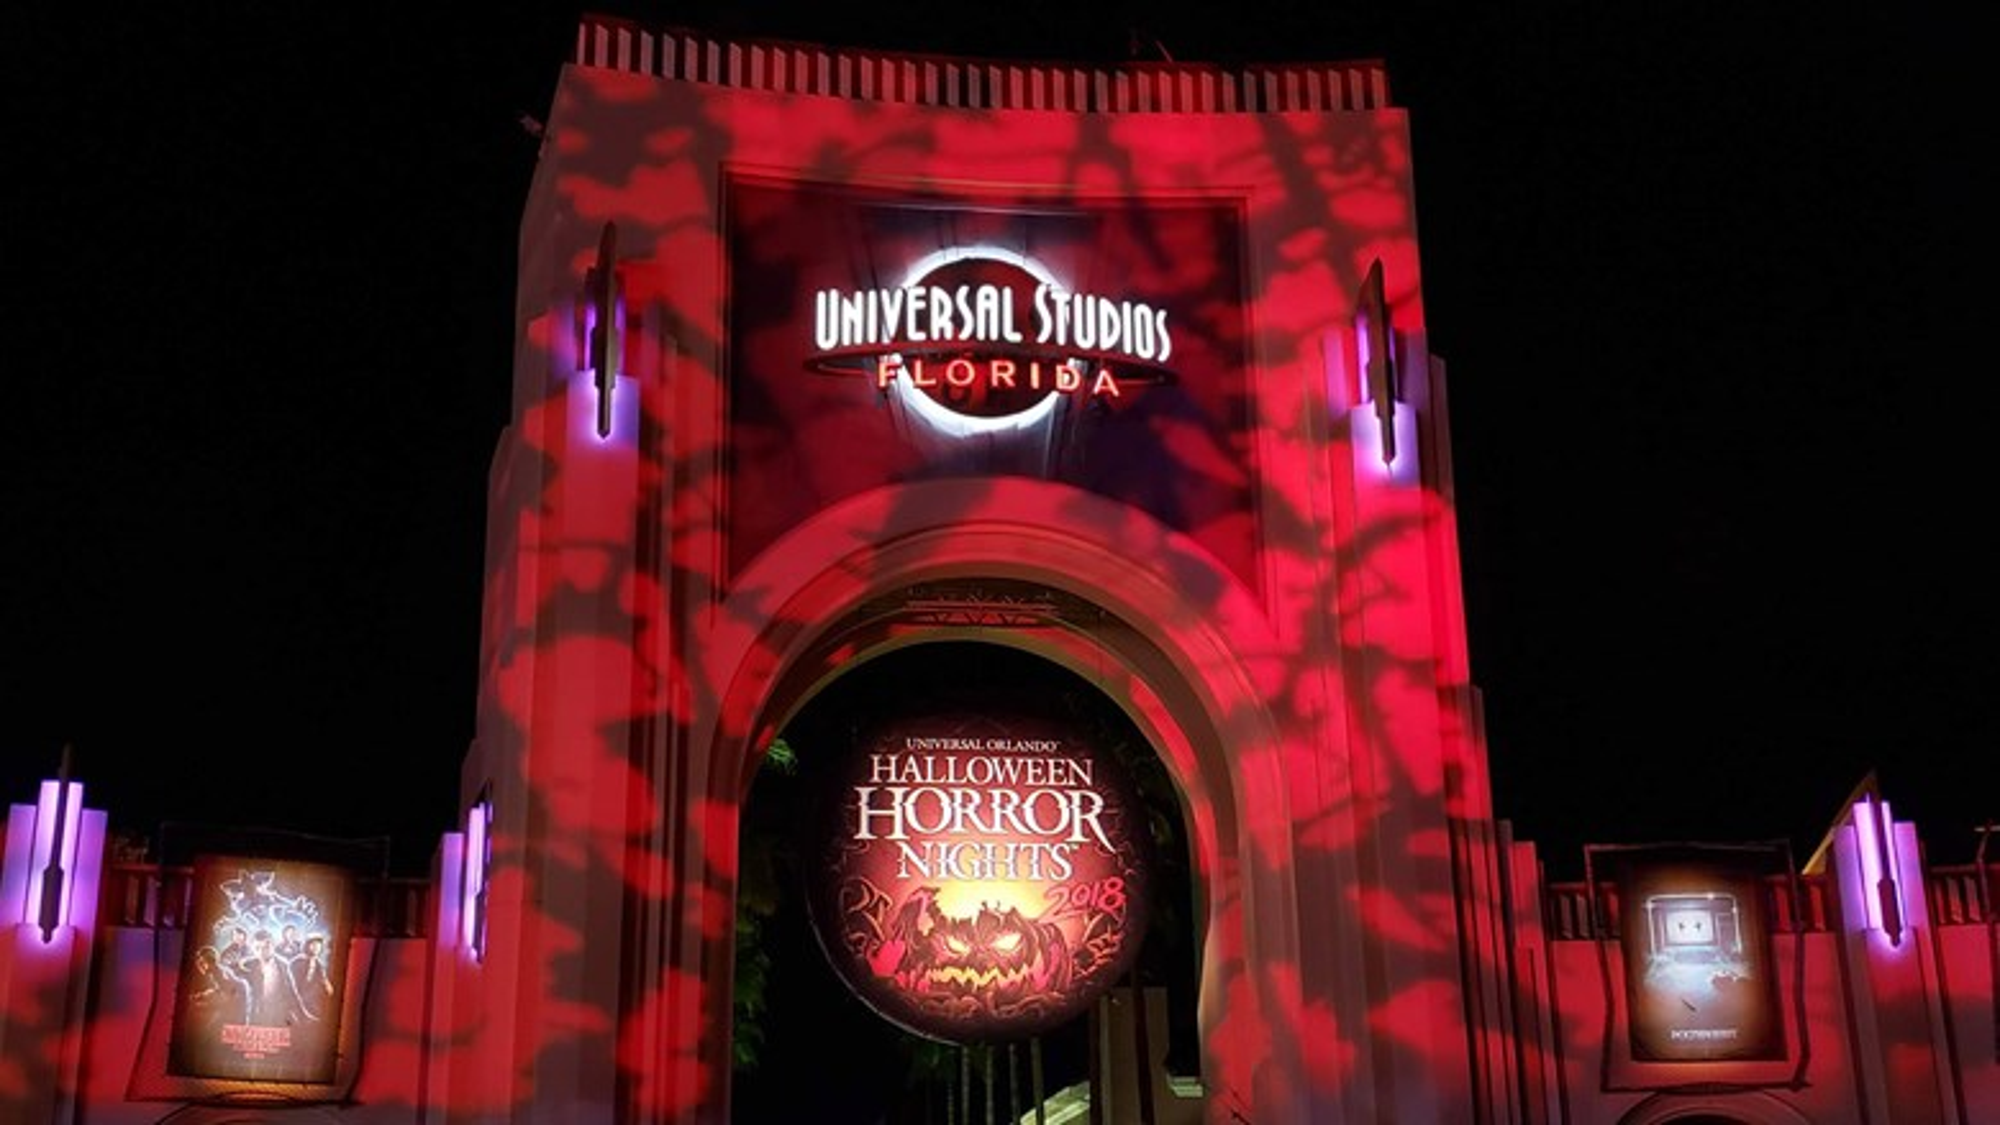 universal studios entrance is dimly lit each night of halloween horror nights